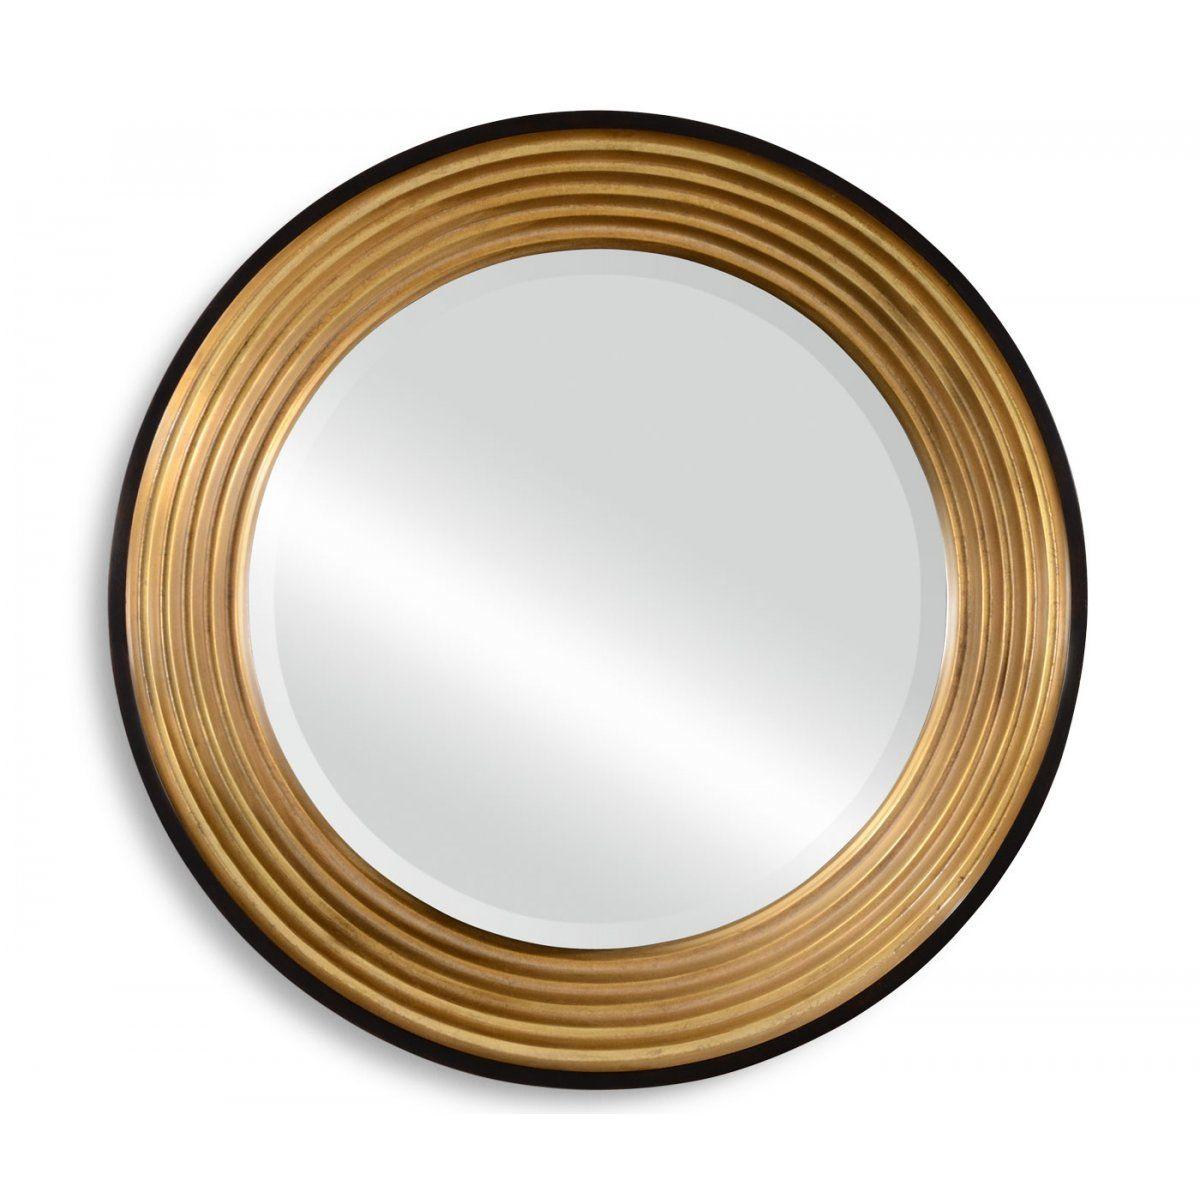 round gold mirror luxury buy art deco round gold mirror swanky interiors jonathan charles furniture hallway m2